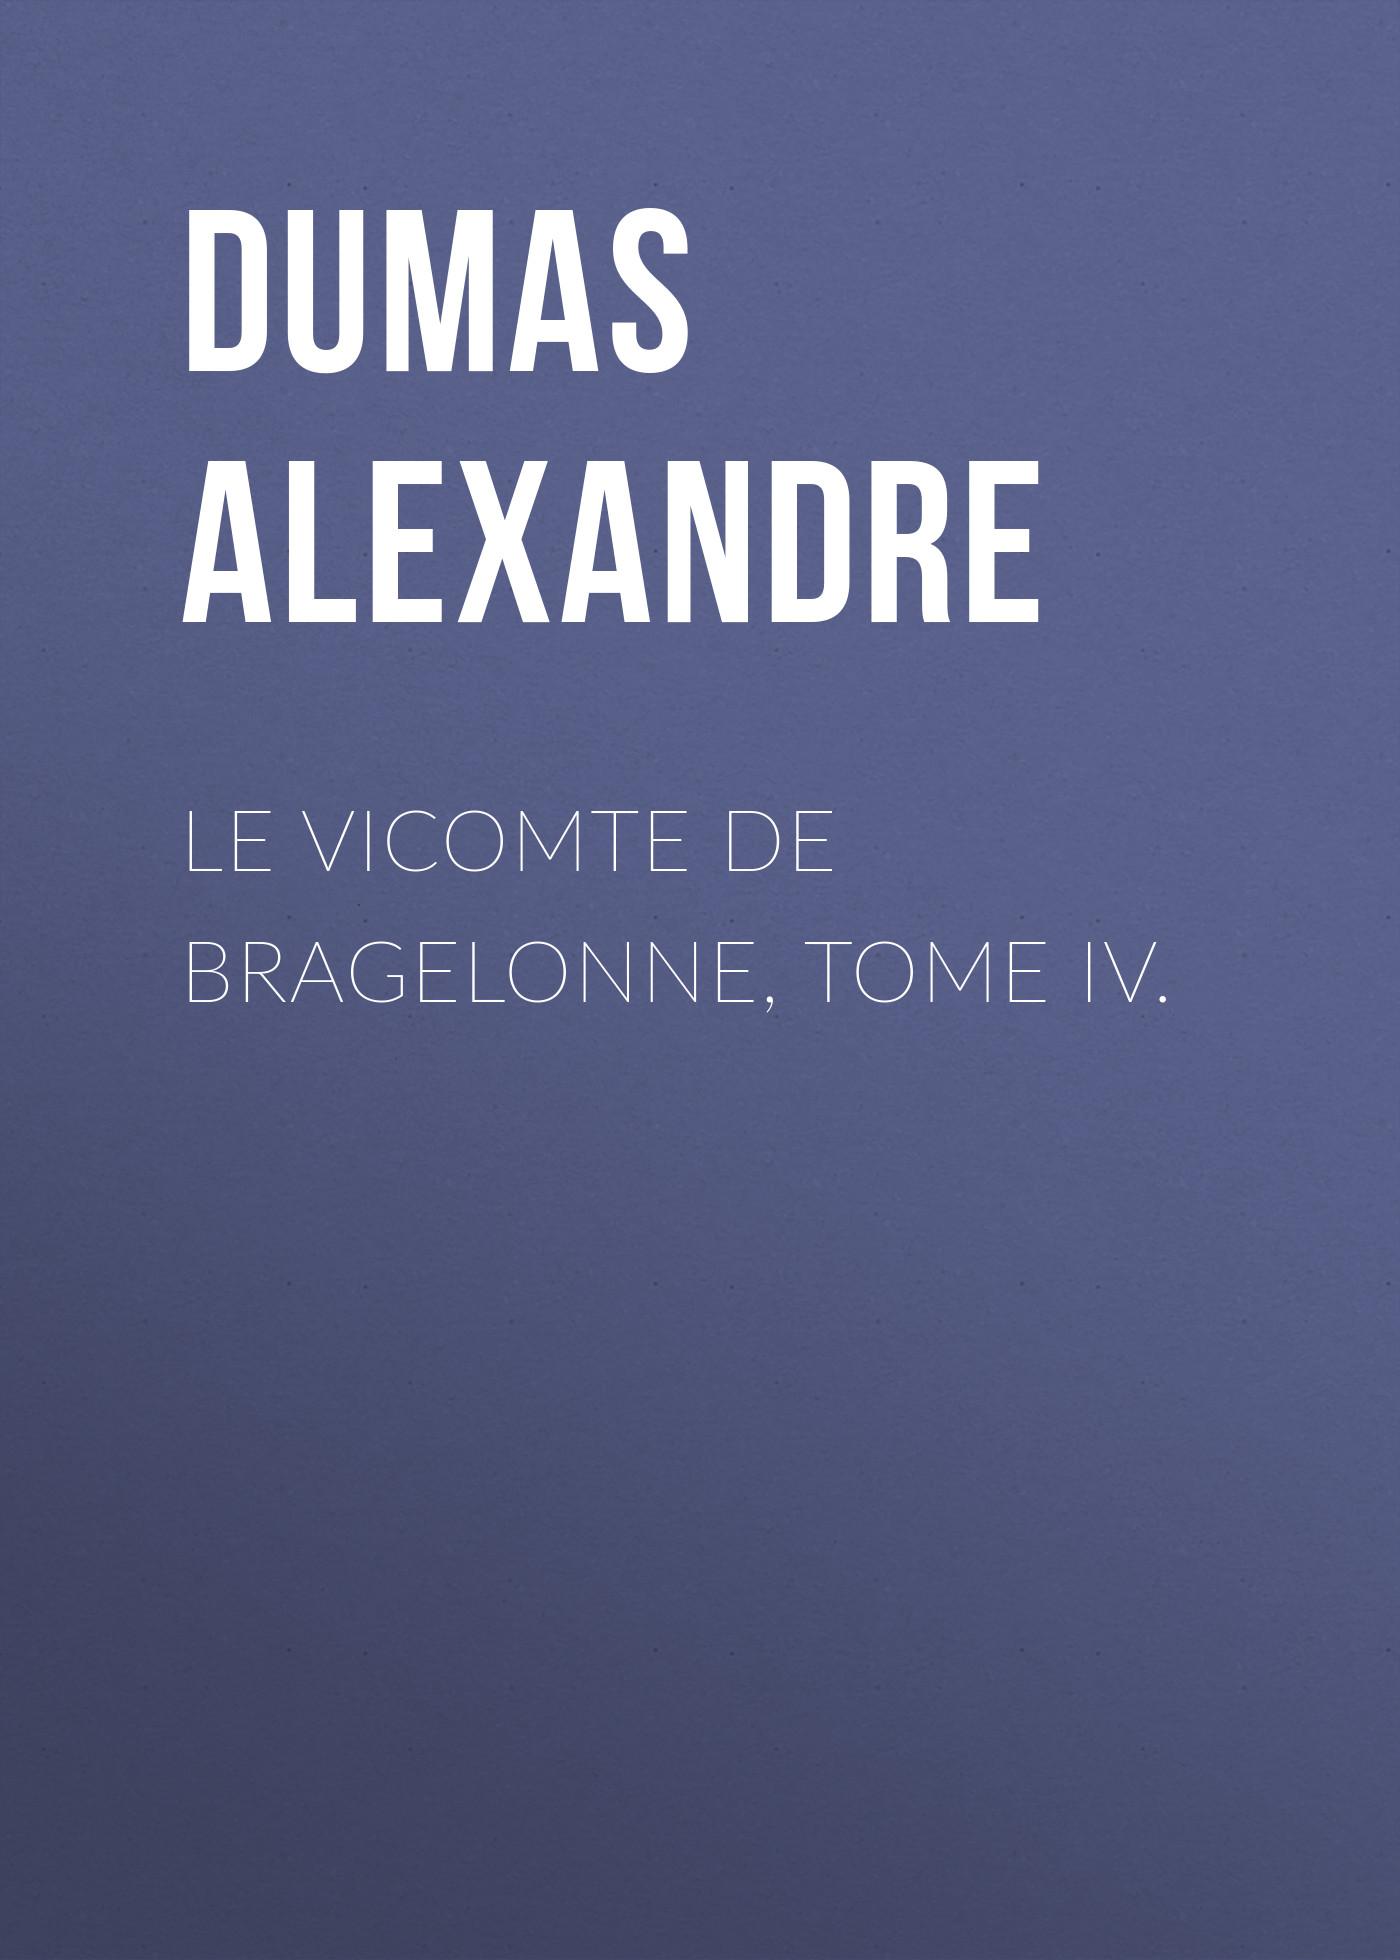 Александр Дюма Le vicomte de Bragelonne, Tome IV. александр дюма le vicomte de bragelonne tome iii